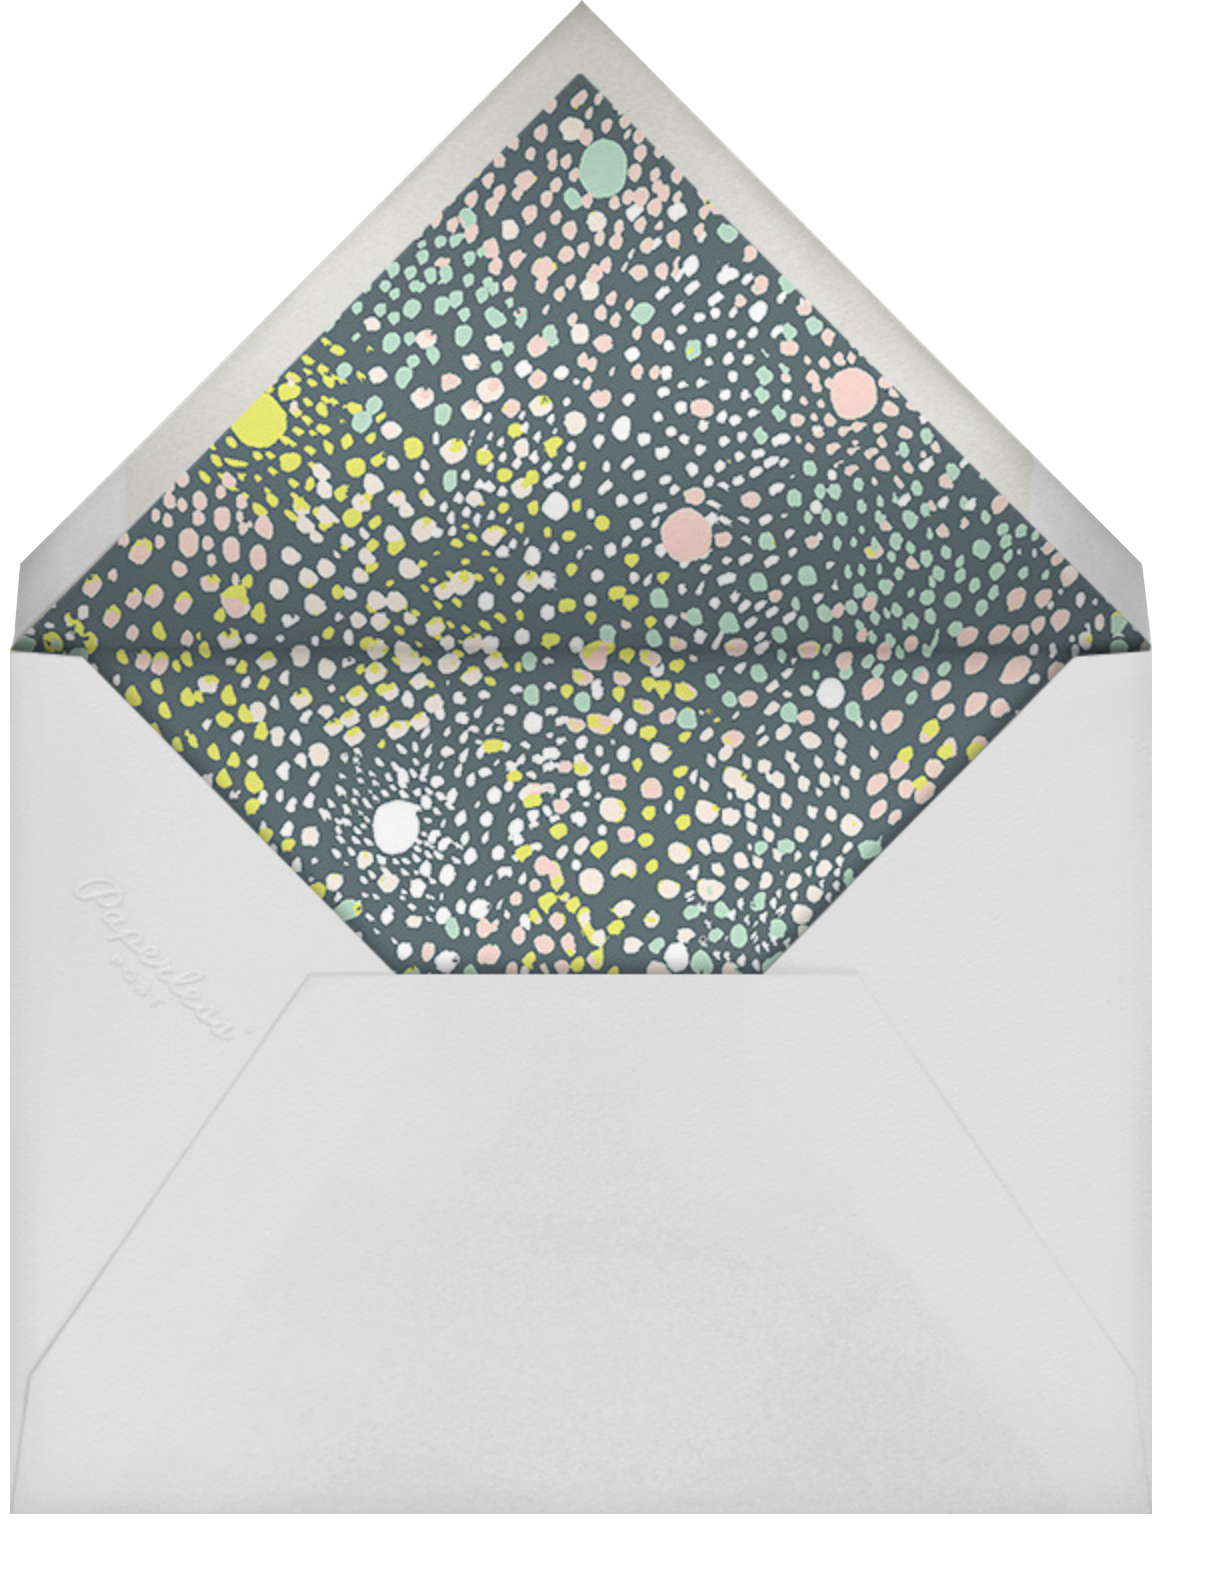 Gracie - Liberty - Adult birthday - envelope back